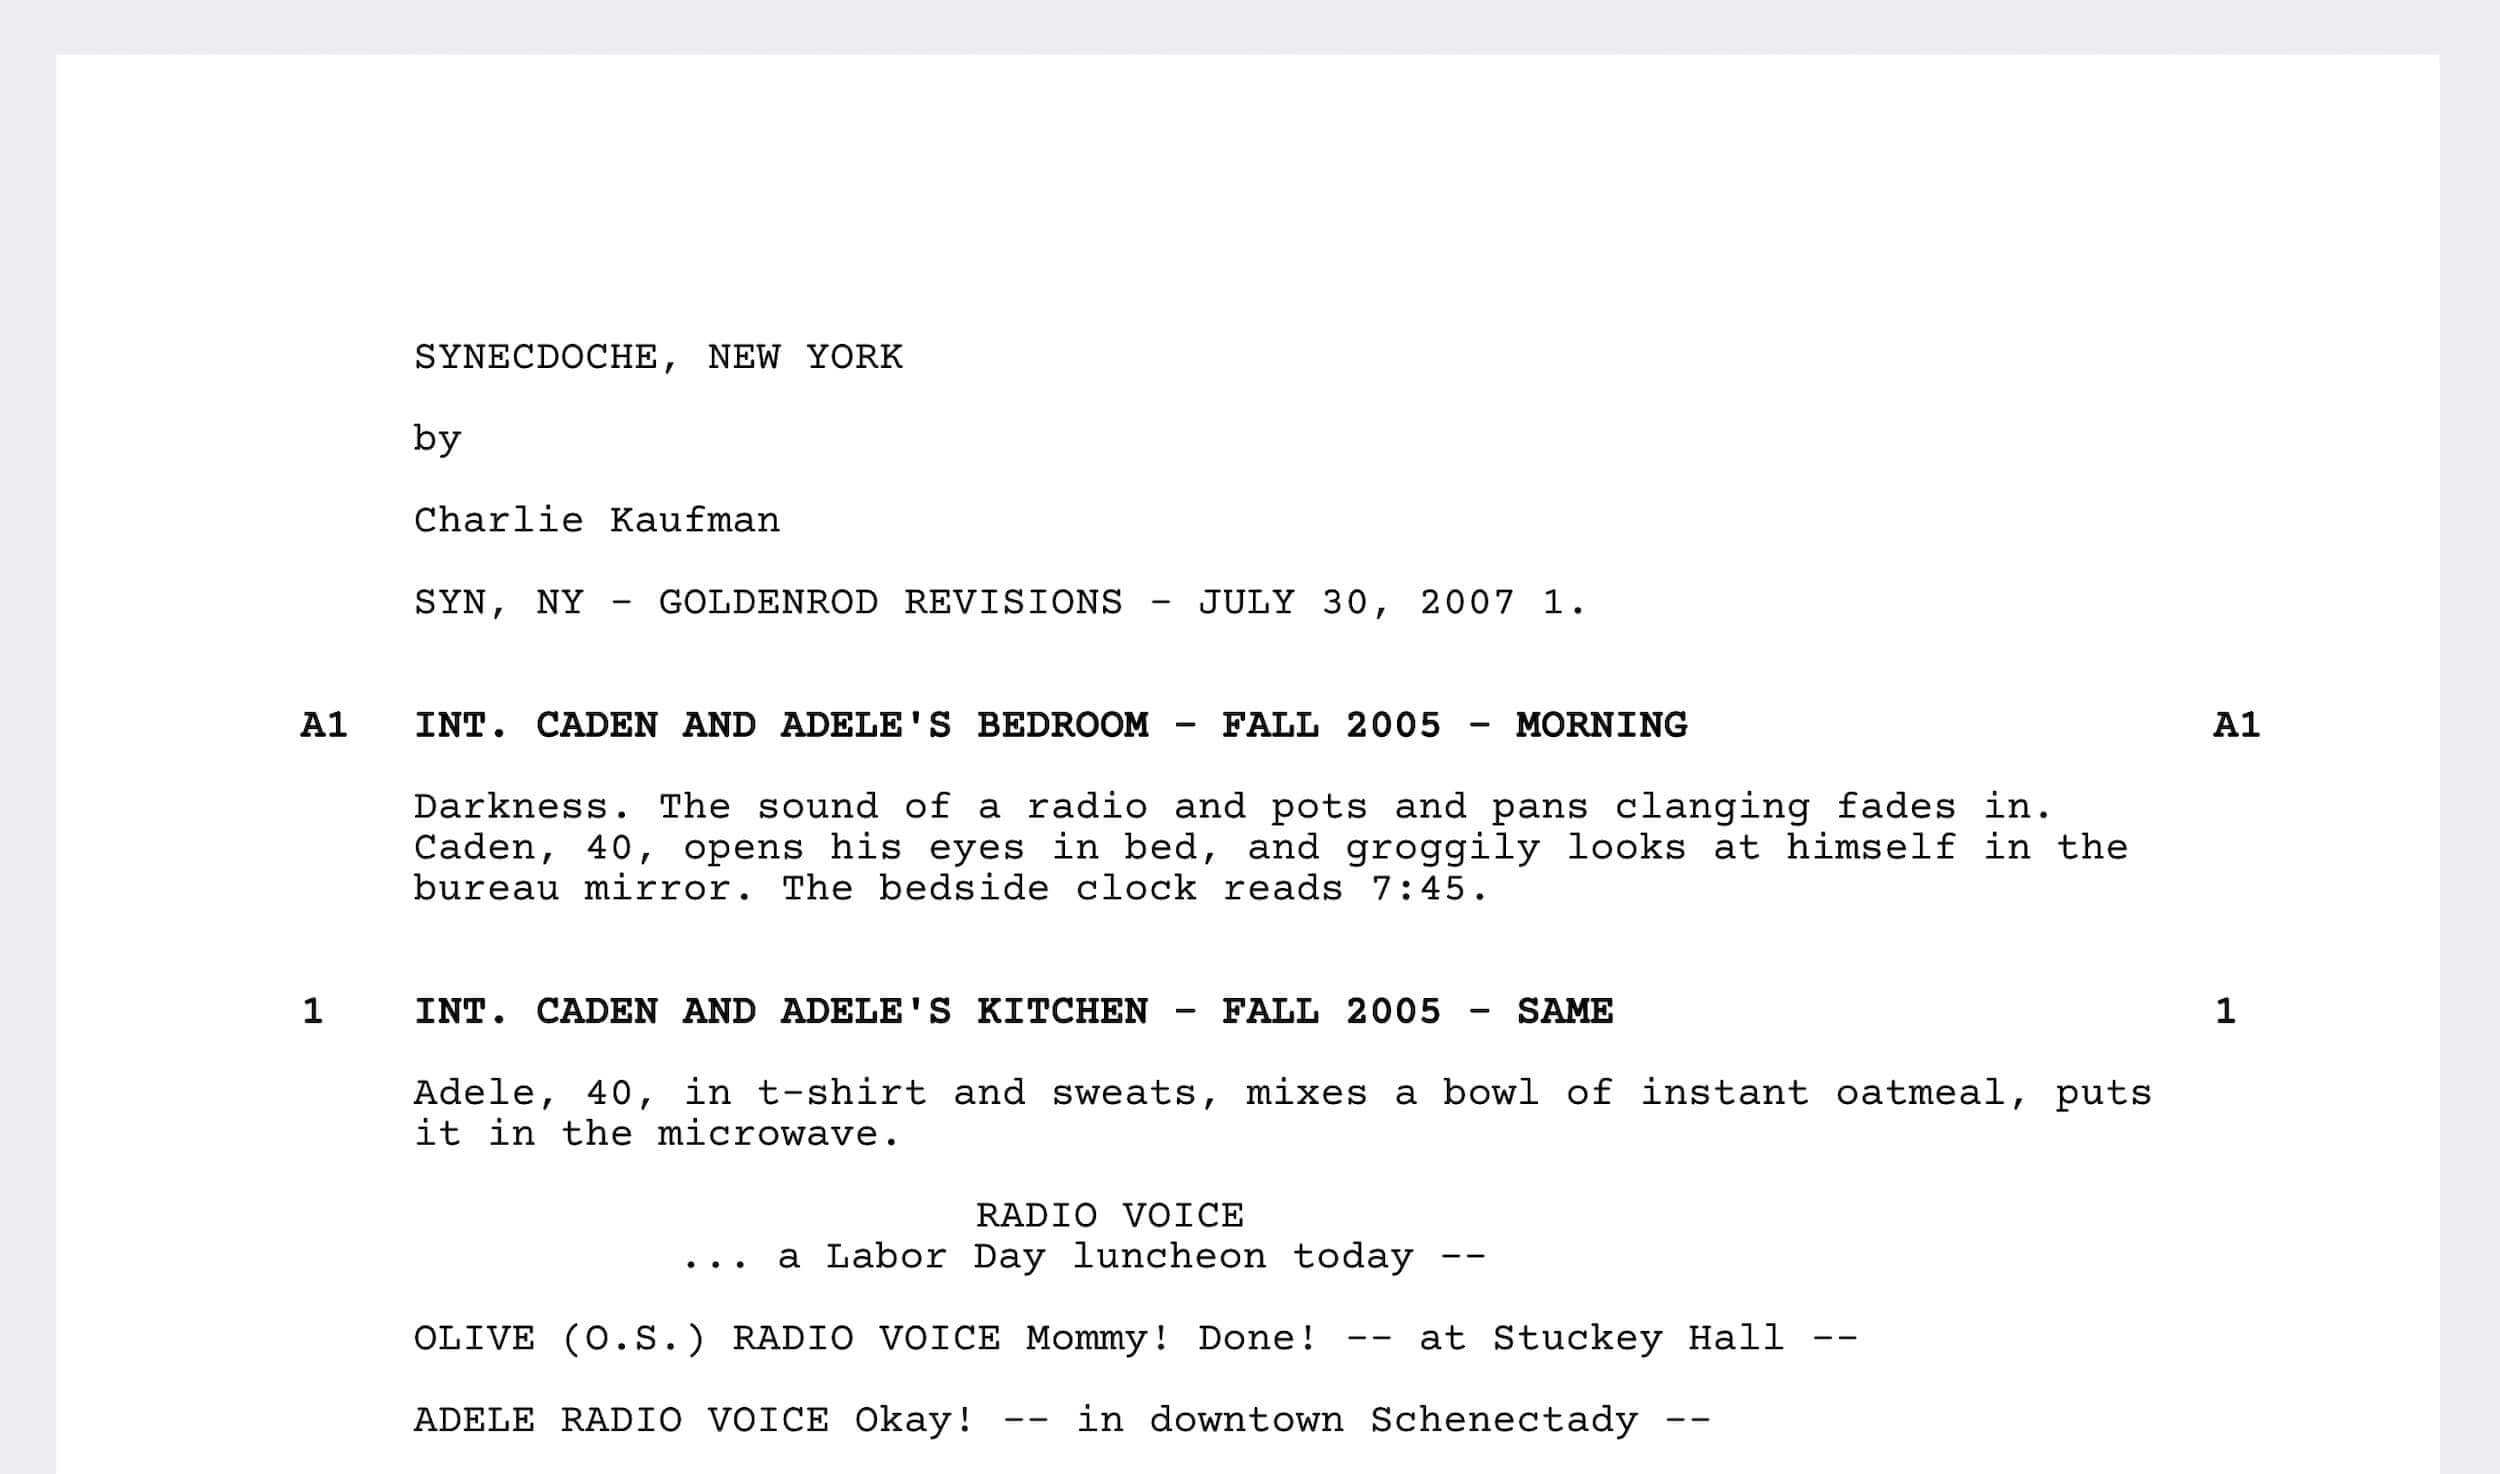 Best Charlie Kaufman Movies - Synedoche New York - StudioBinder